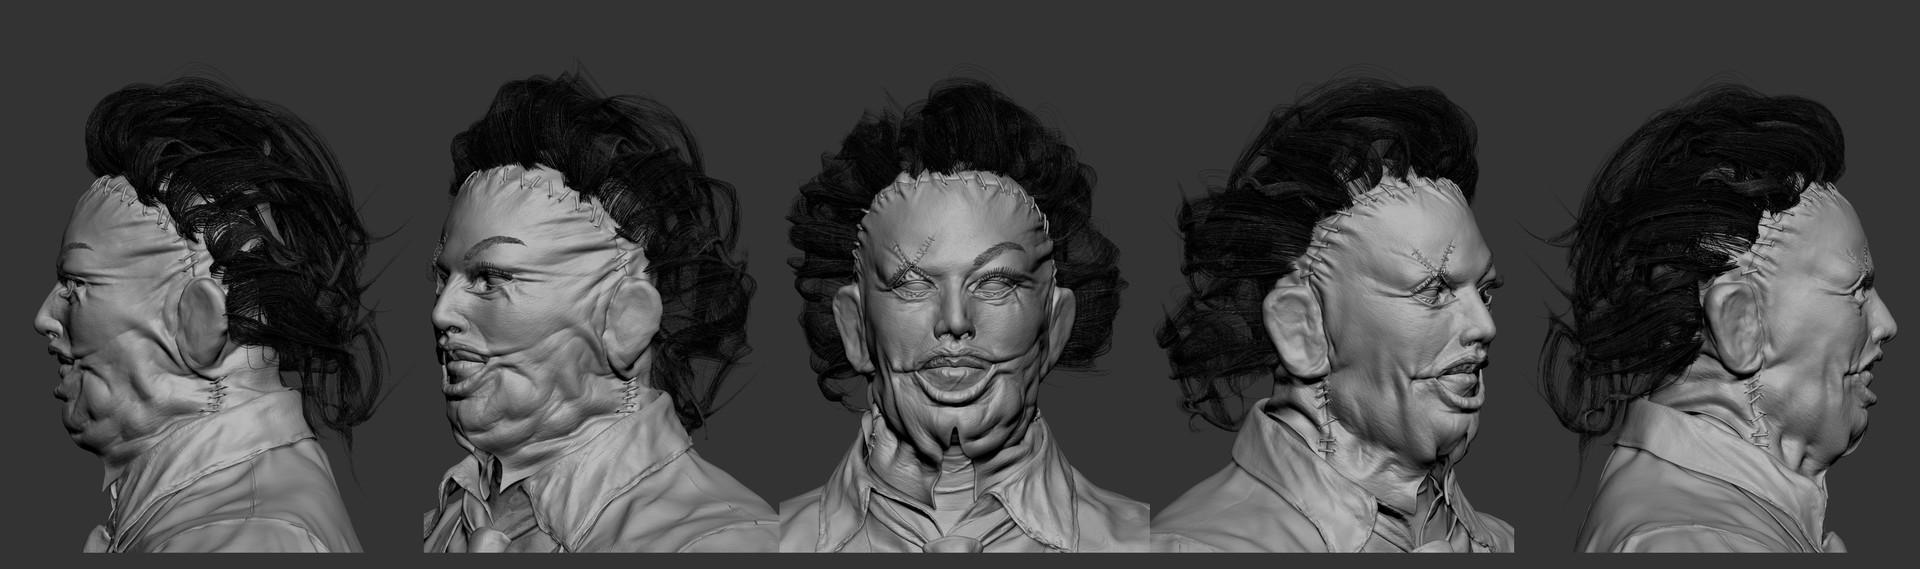 Solomon gaitan leatherface prettyladymask